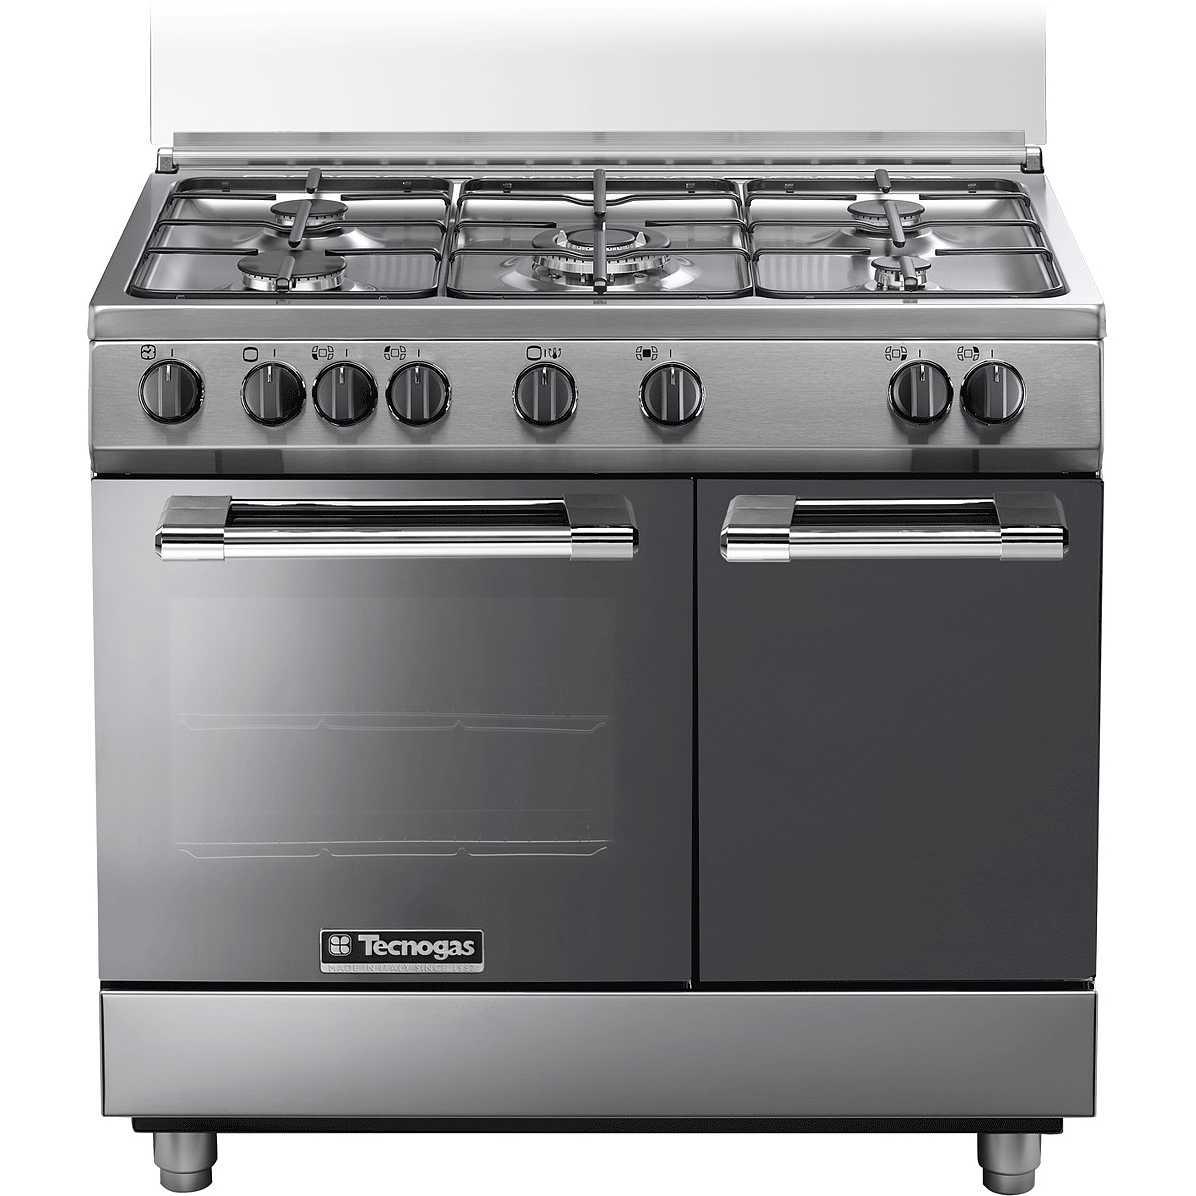 Tecnogas pb965mx cucina 90x60 5 fuochi a gas forno - Cucina gas 5 fuochi ...